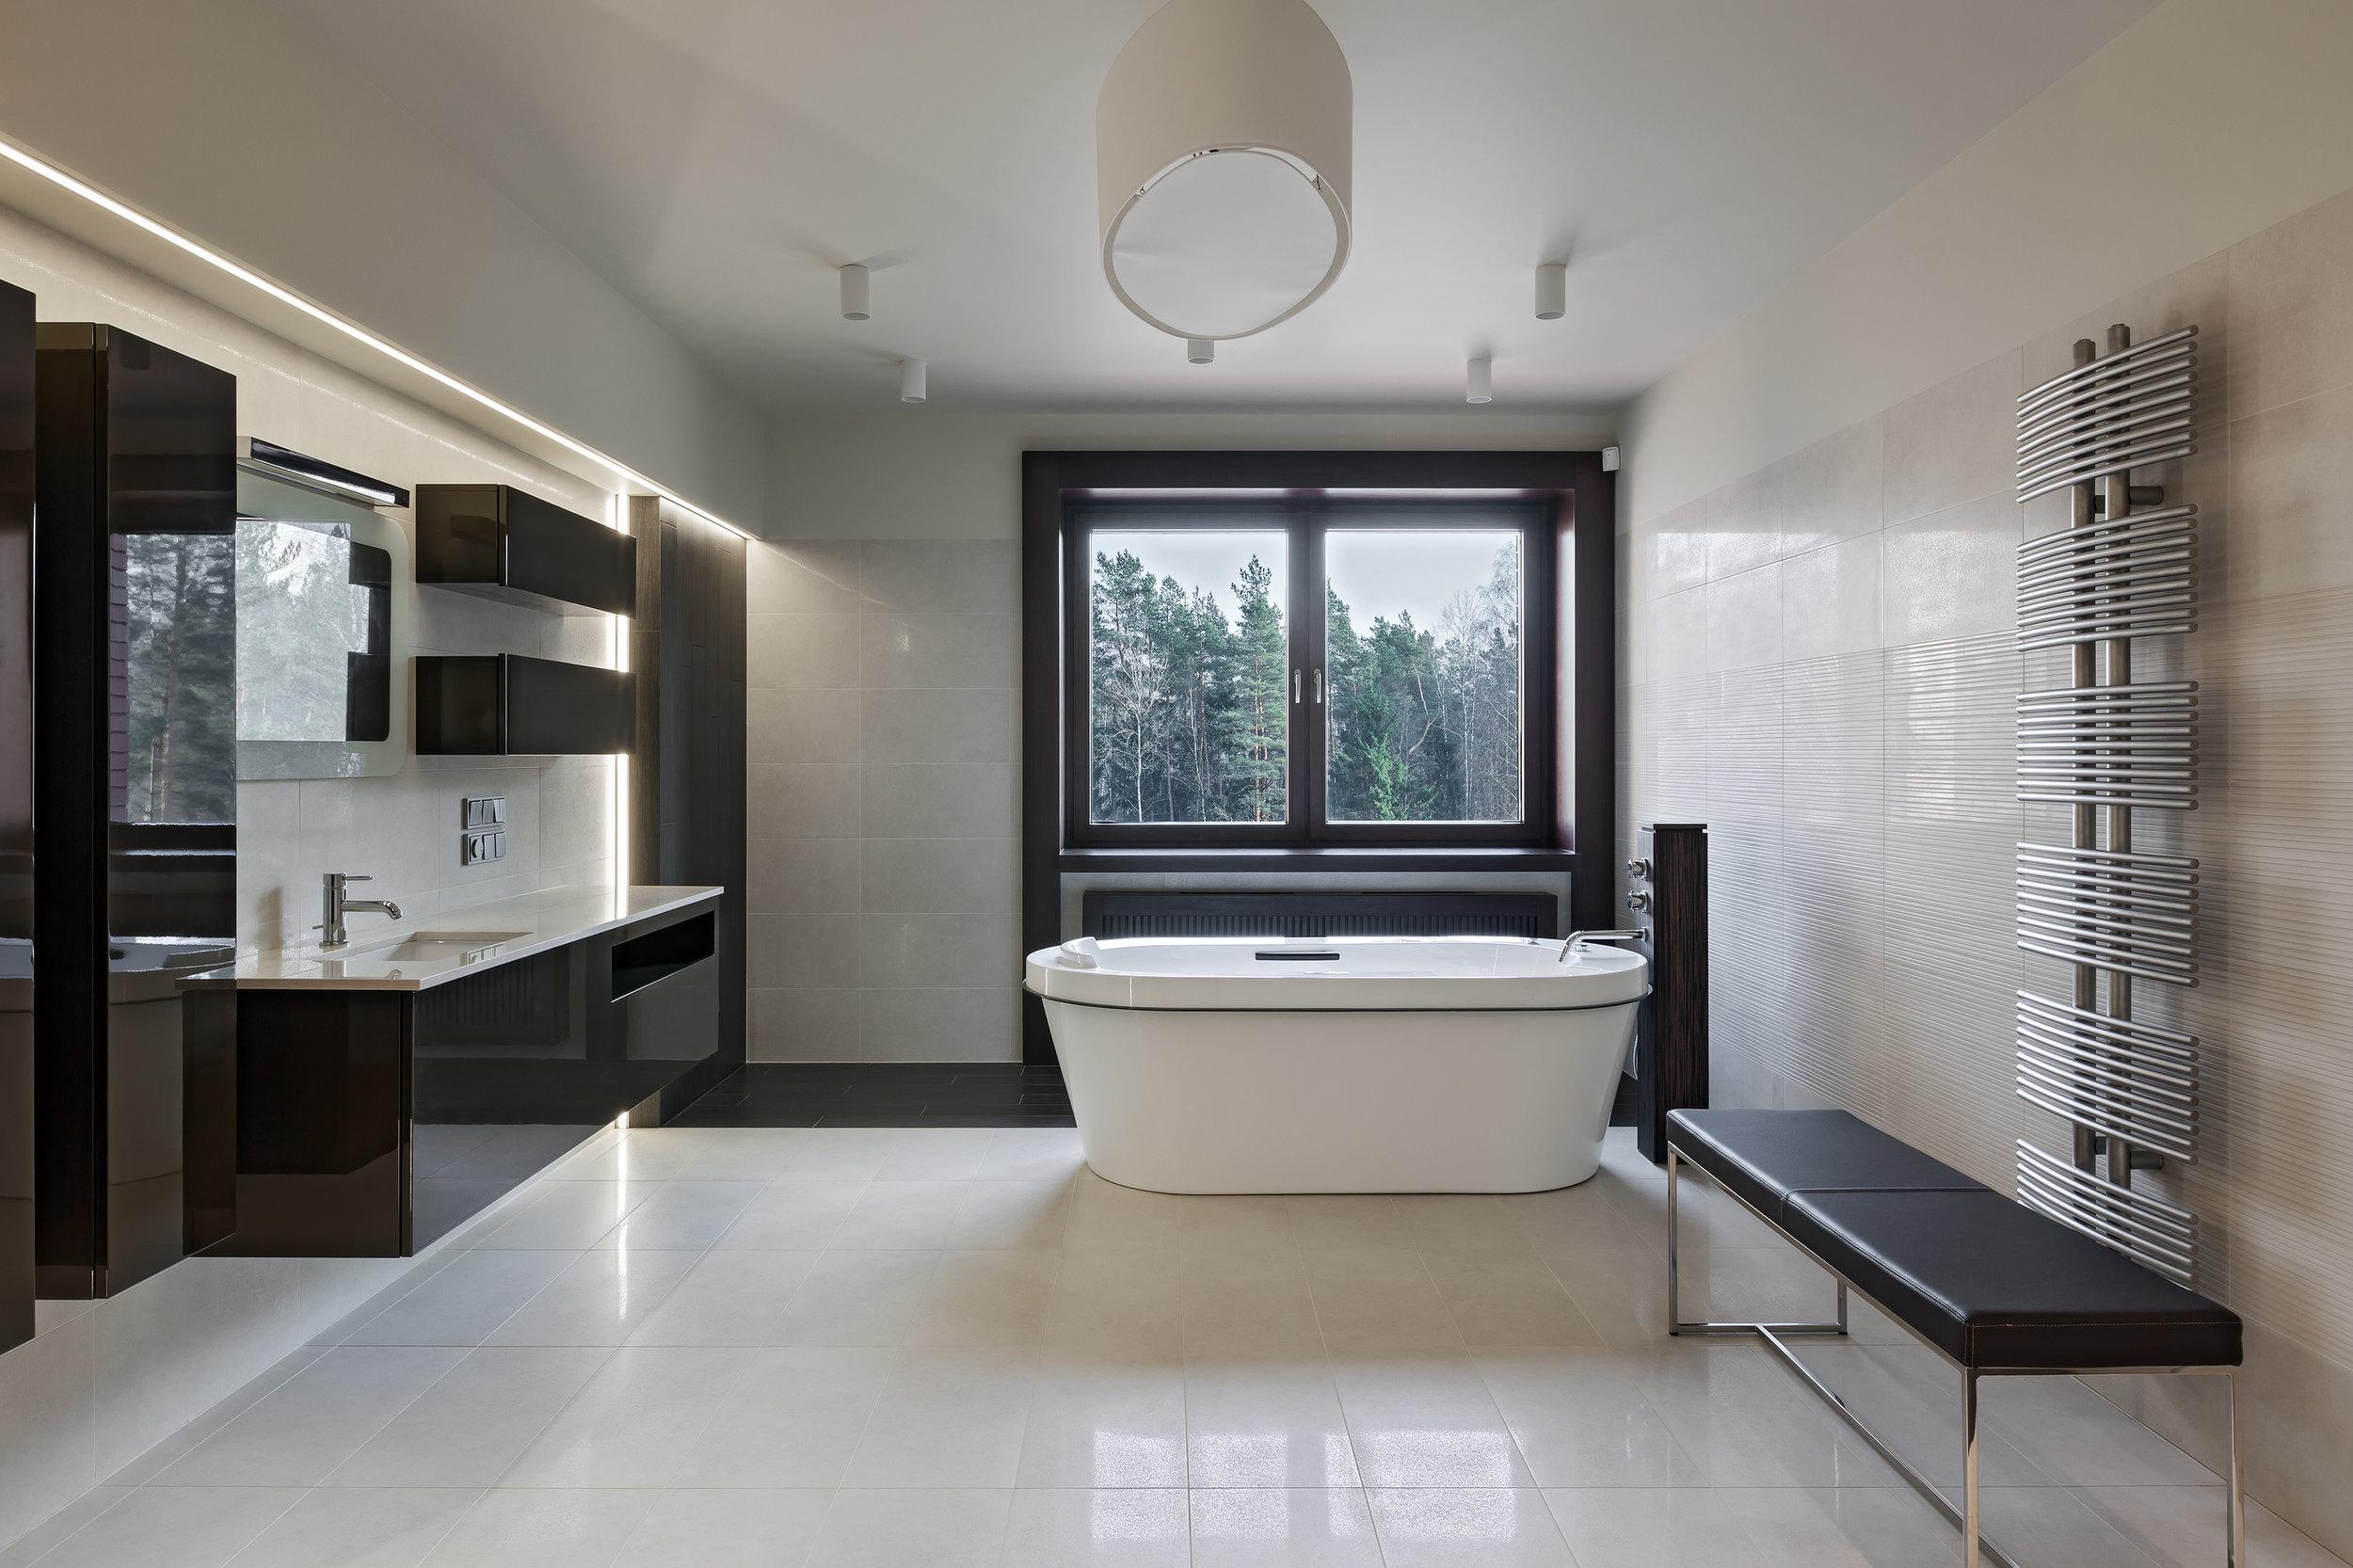 bigstock-Luxury-Bathroom-Interior-101267285.jpg